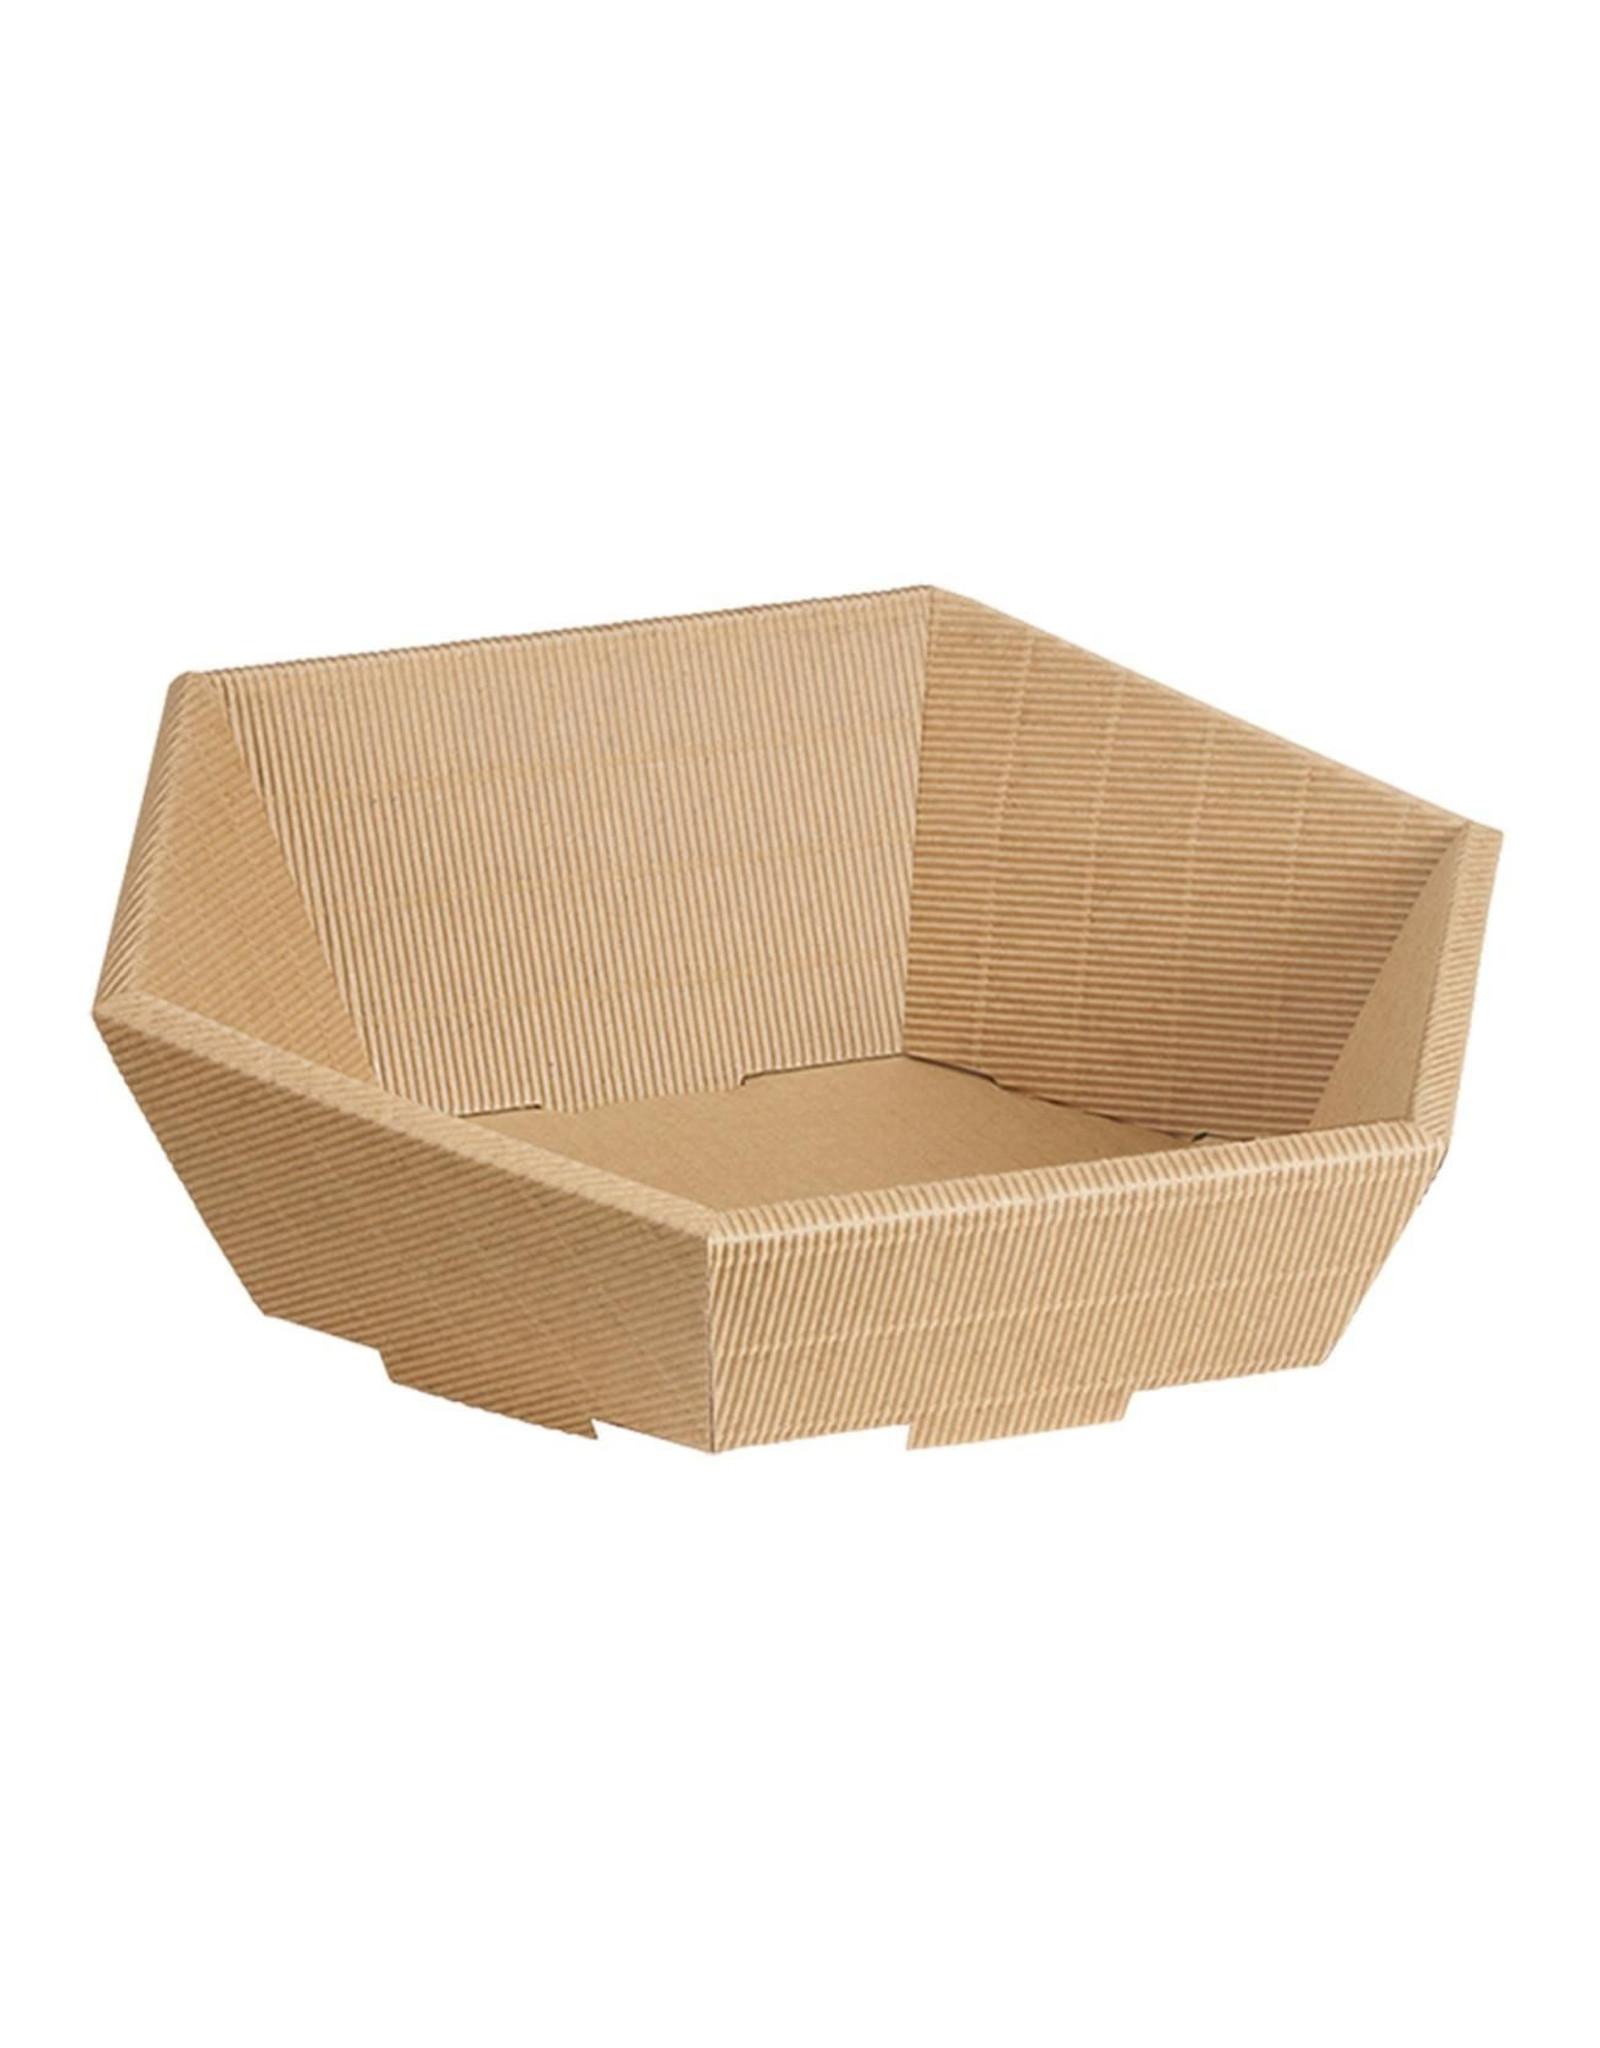 Gift basket 34x38x13cm